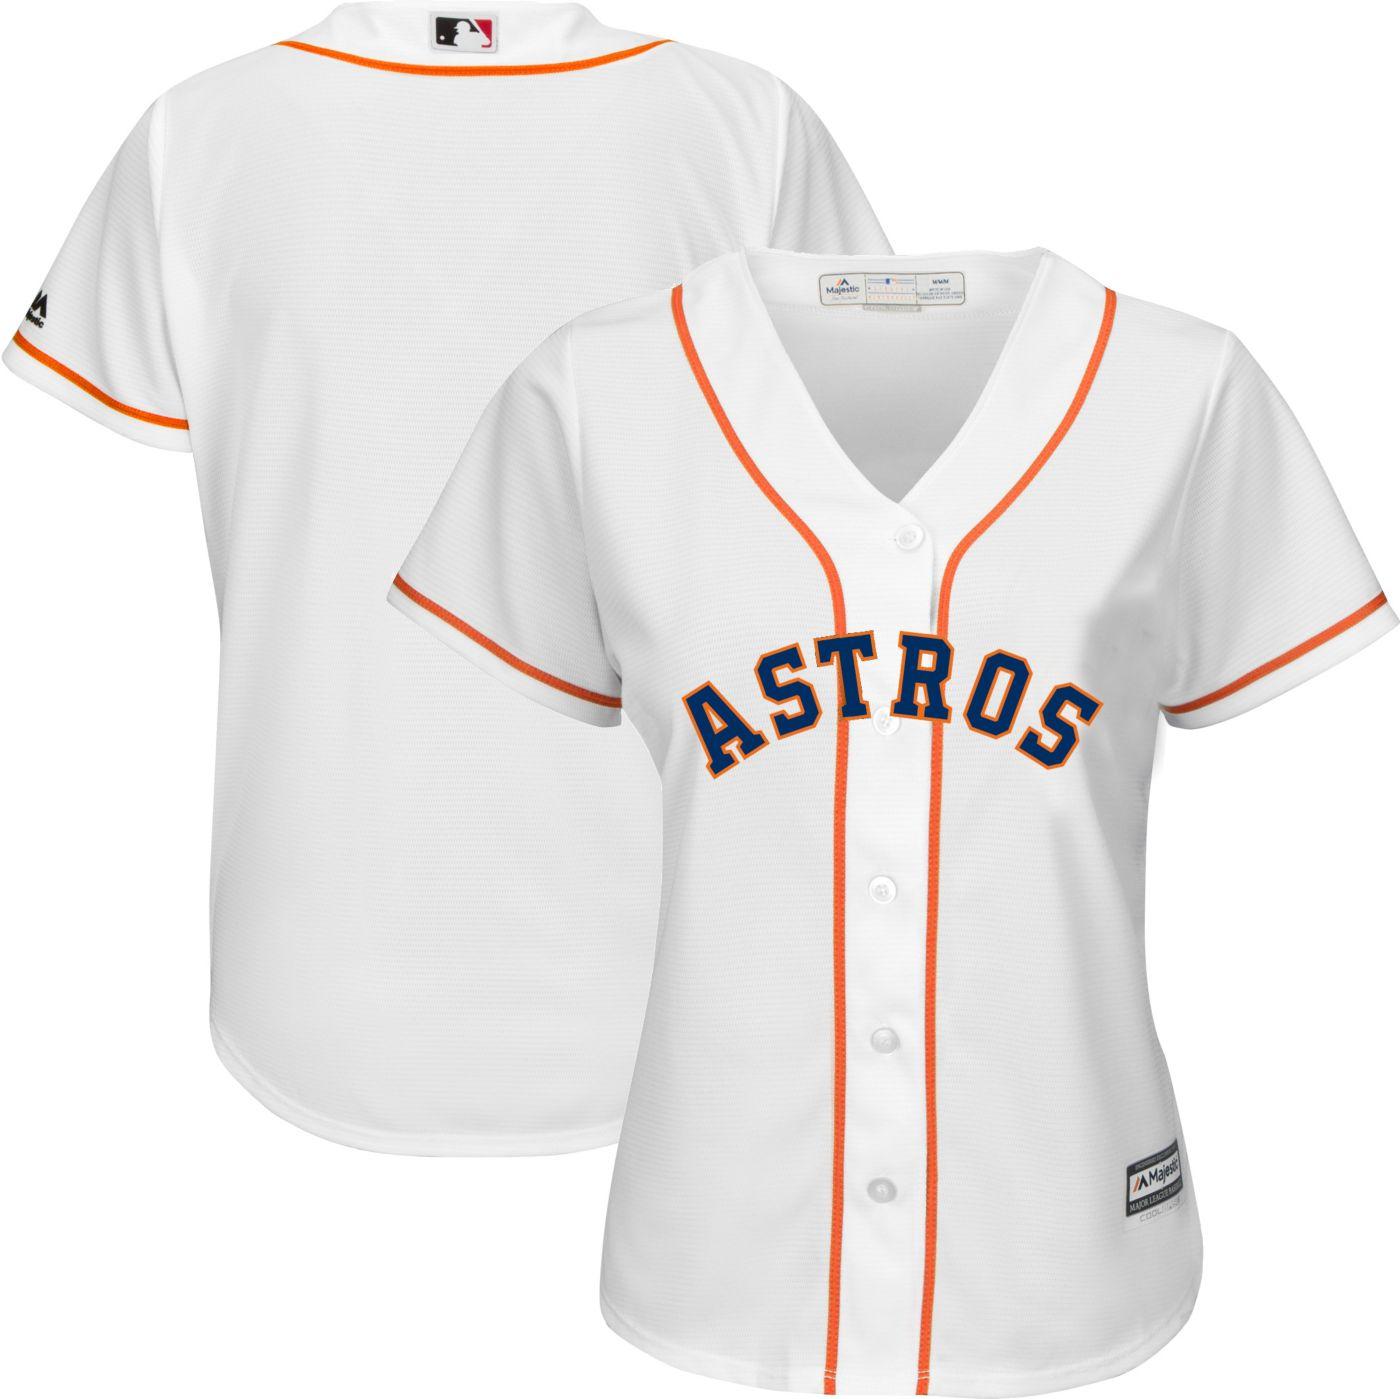 Majestic Women's Replica Houston Astros Cool Base Home White Jersey